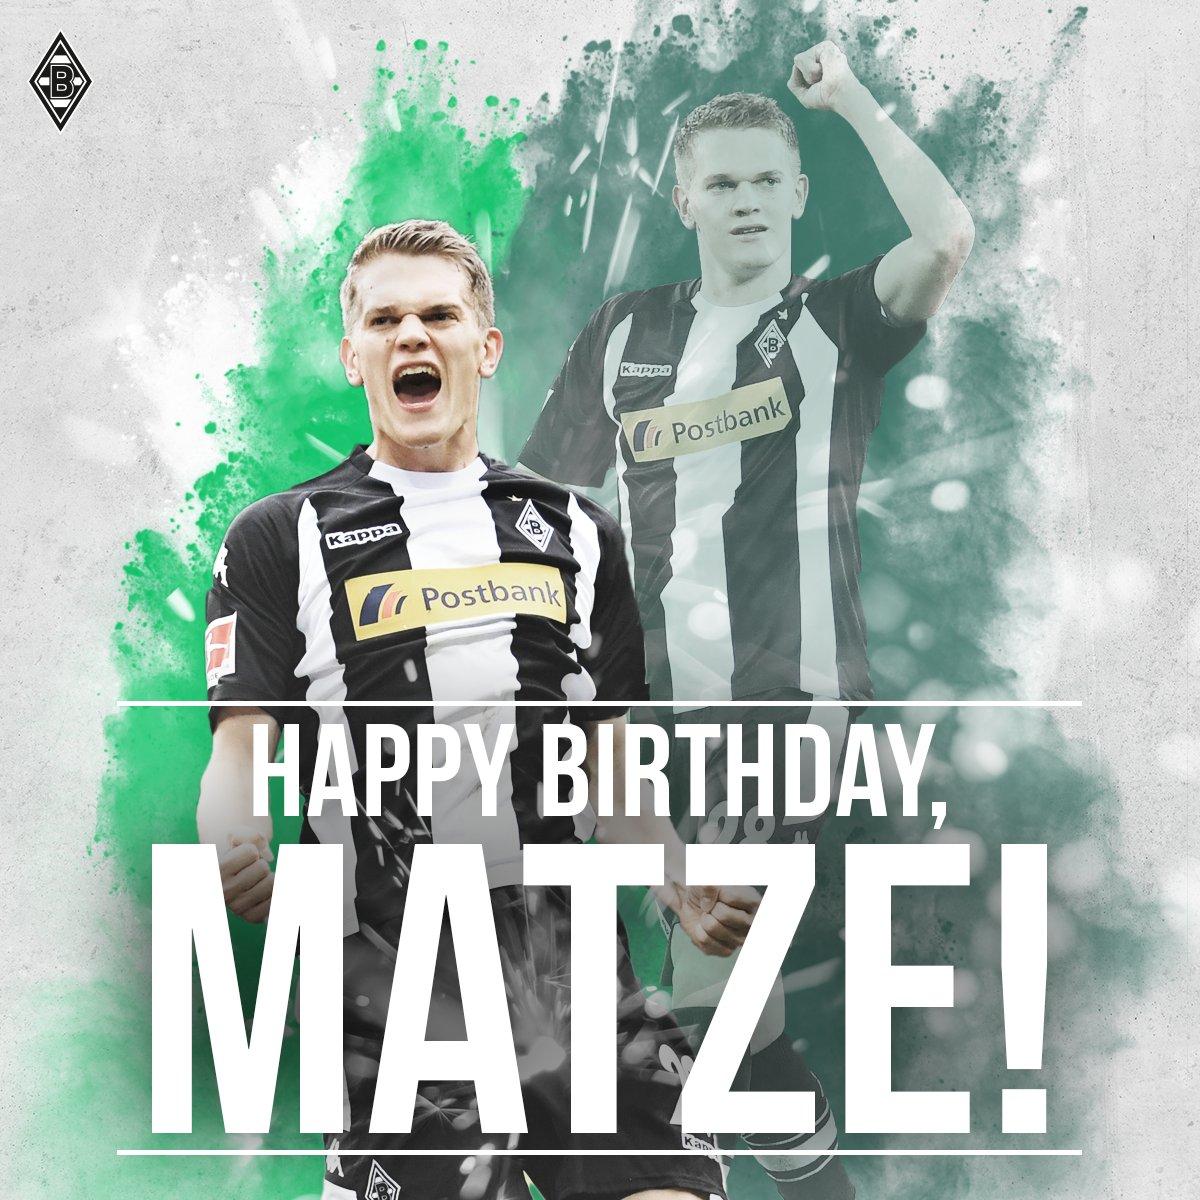 He's only 24!? Happy birthday, @MatzeGin...